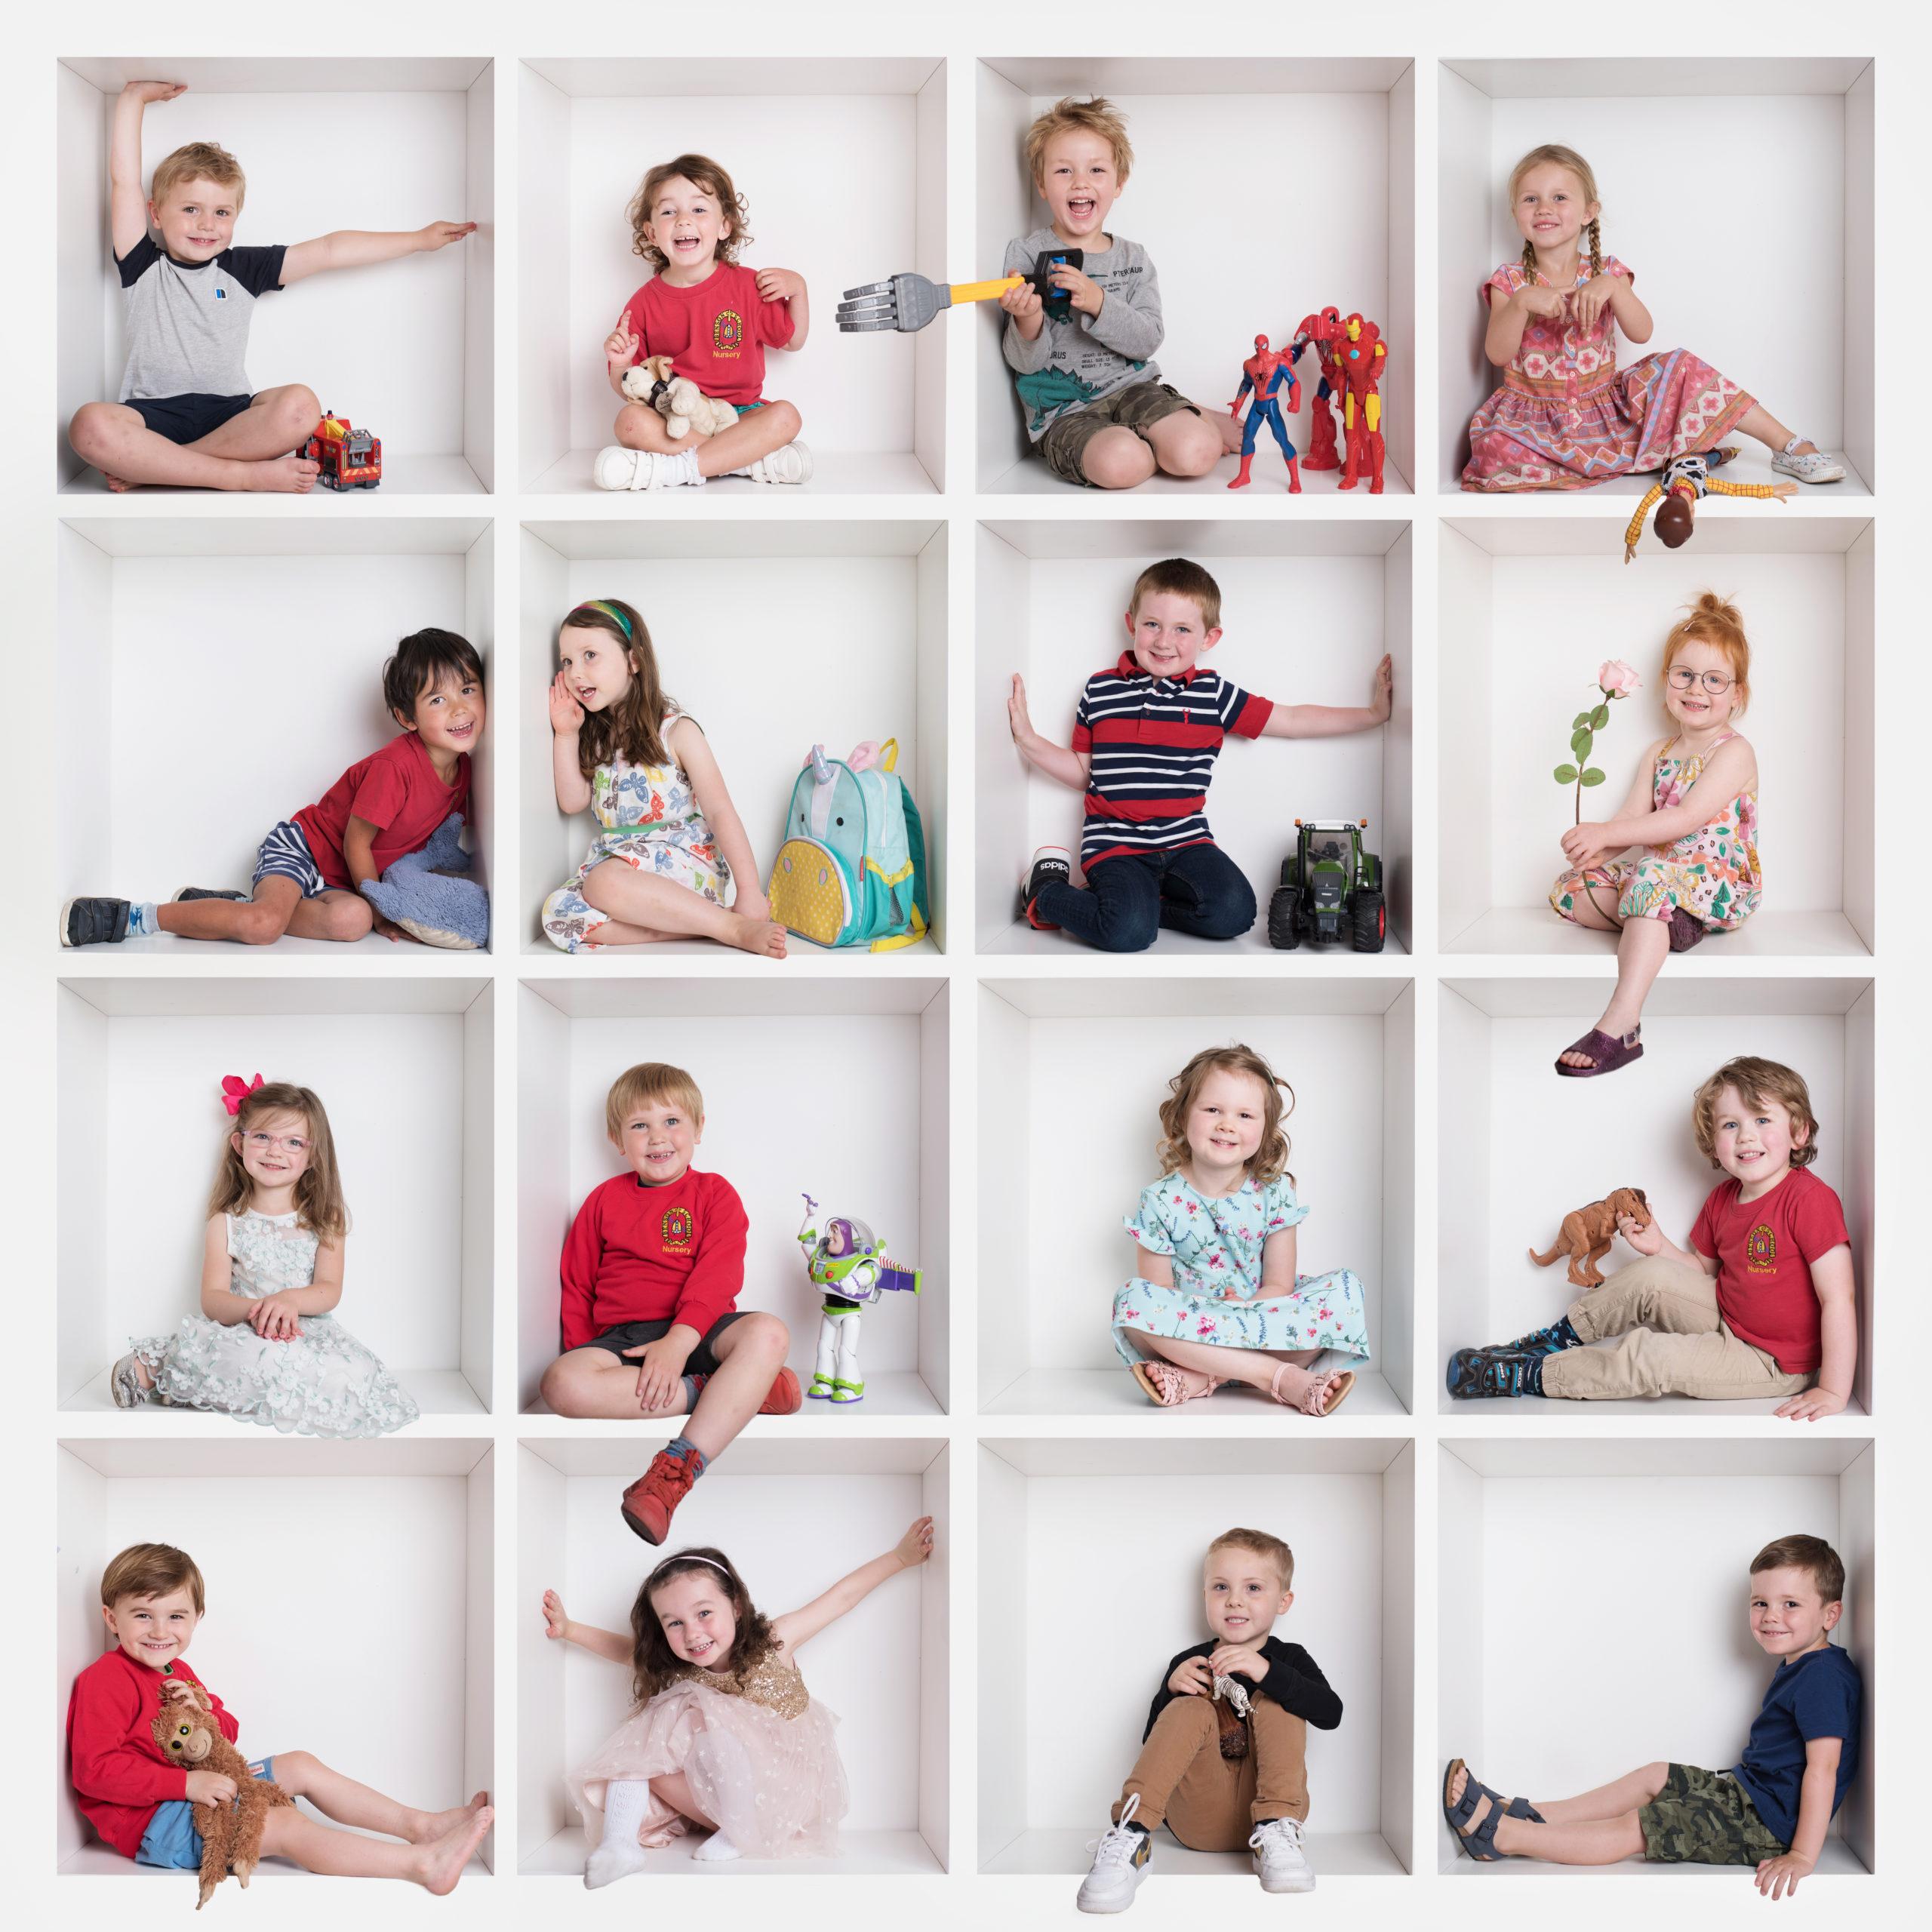 Preschool children in white box birthday photoshoot in Wallingford